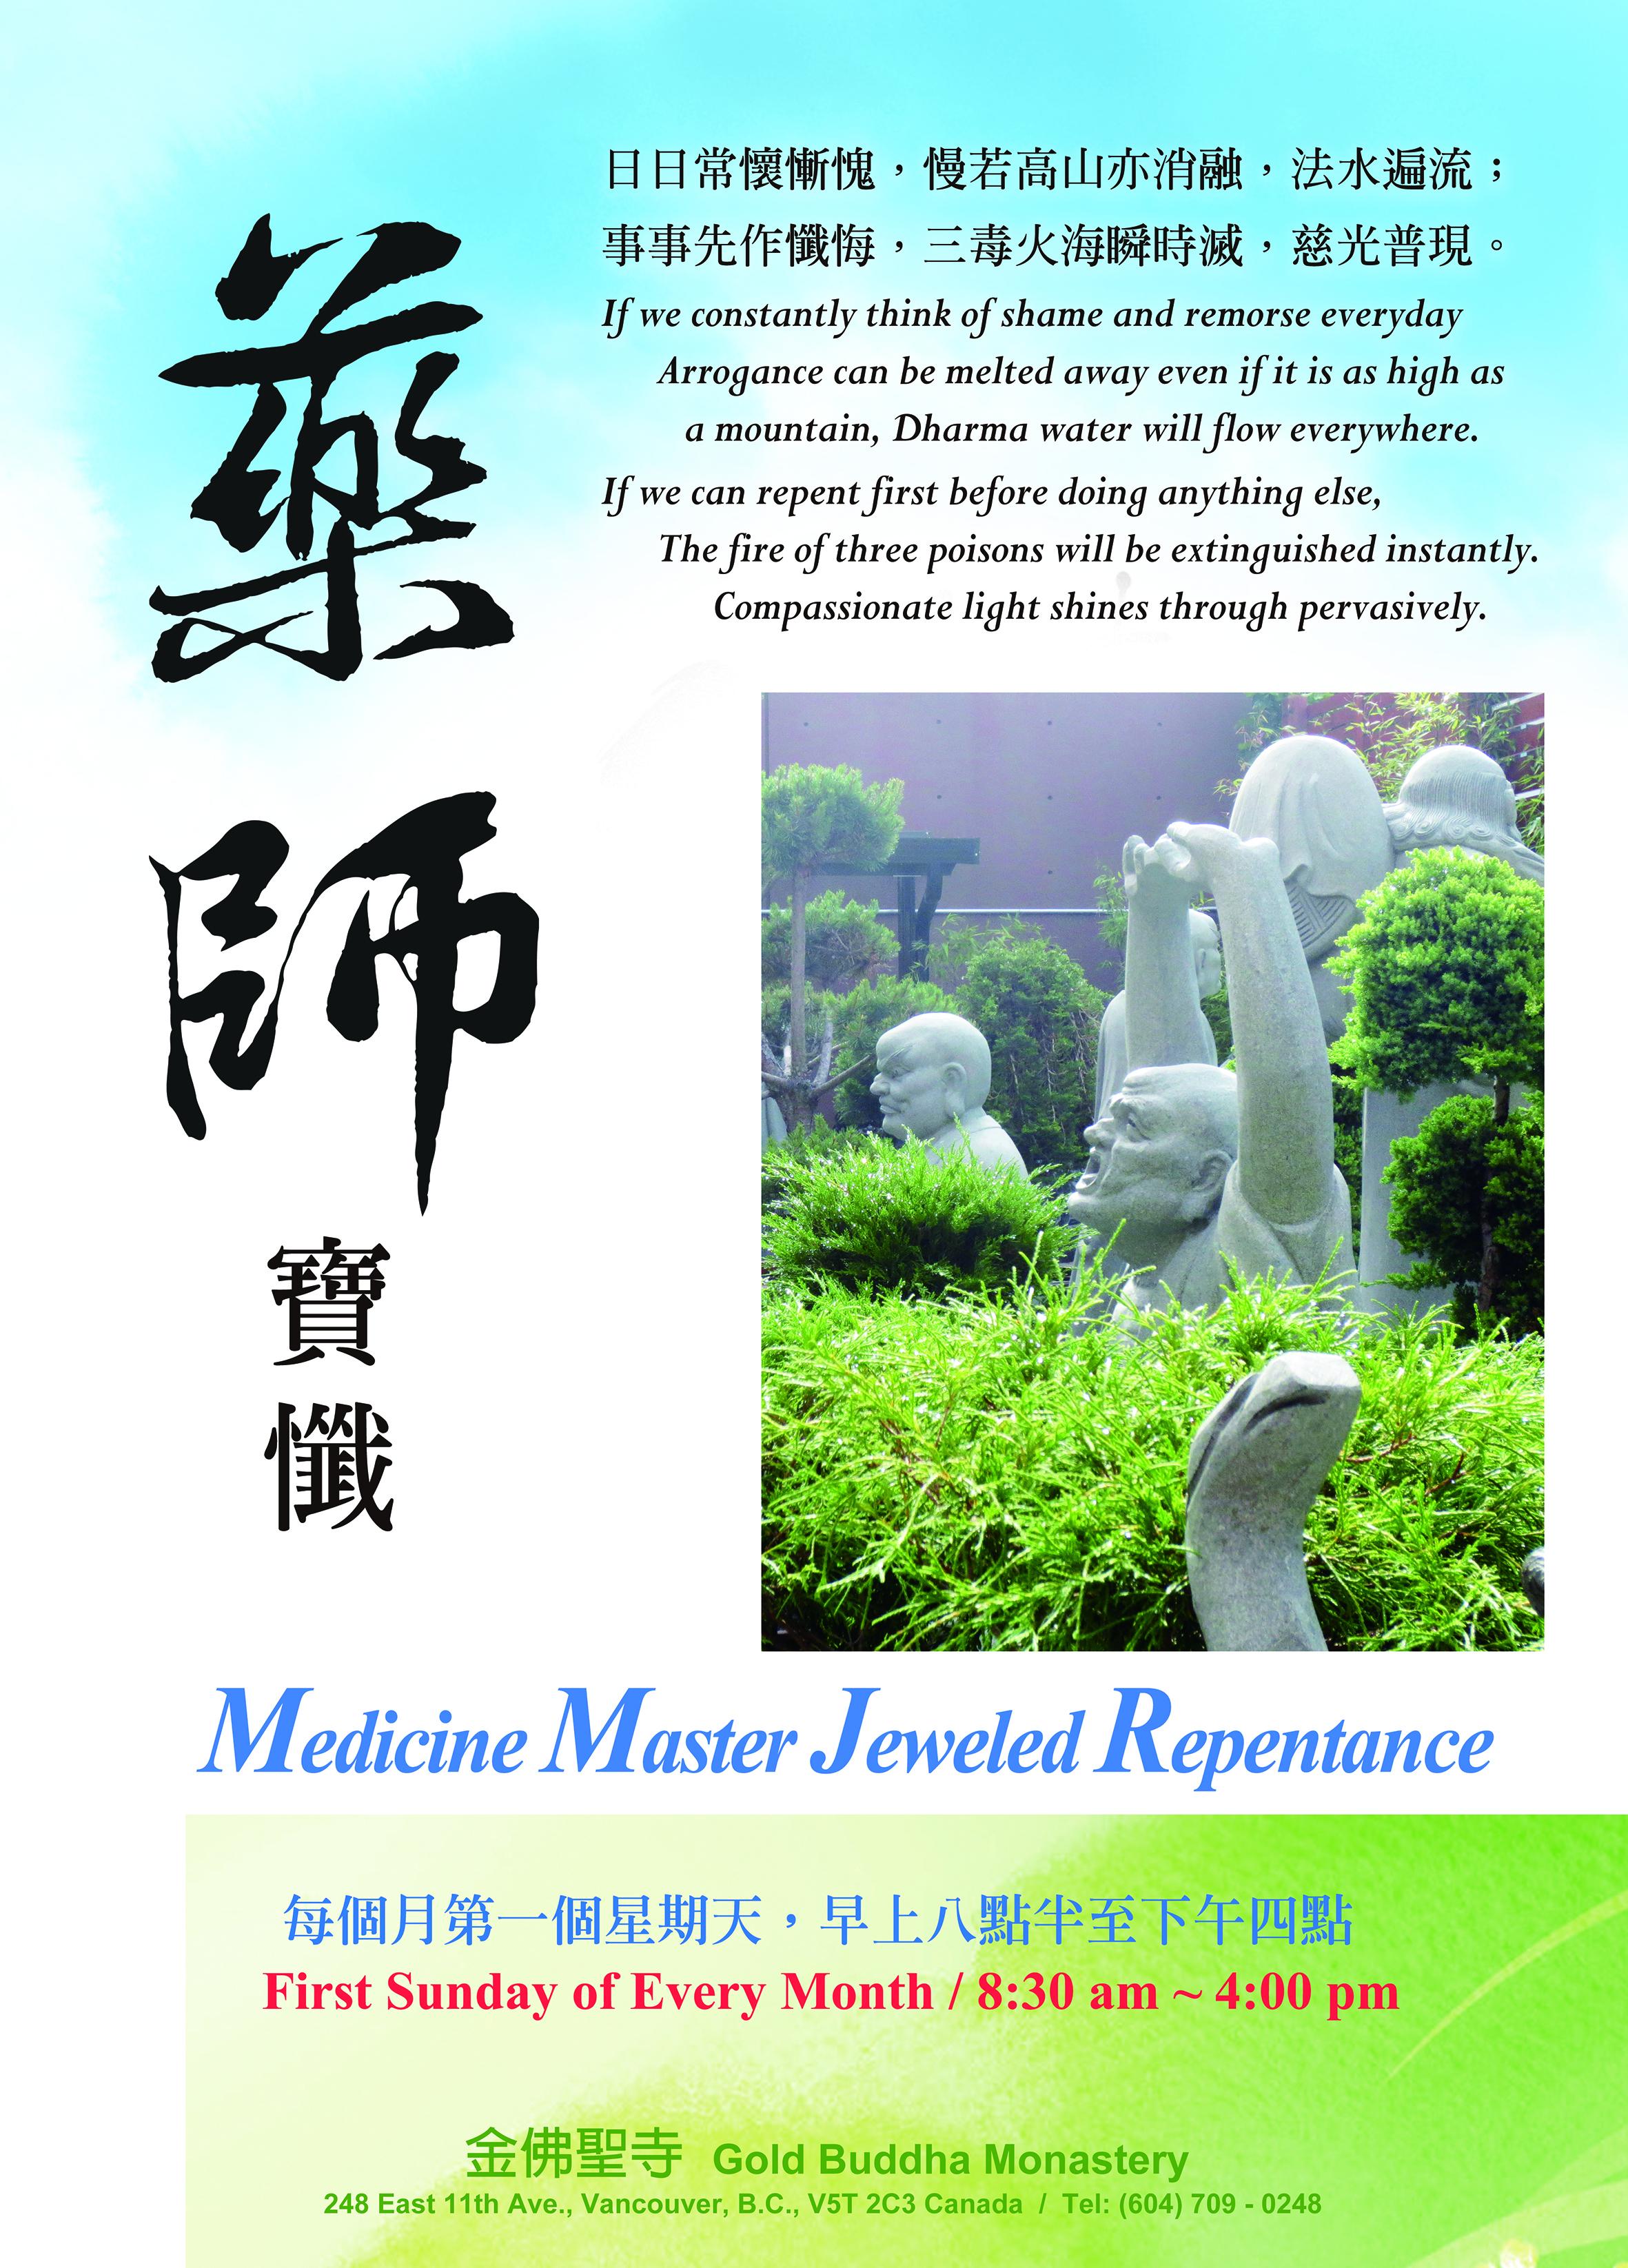 Medicine Master Repentance